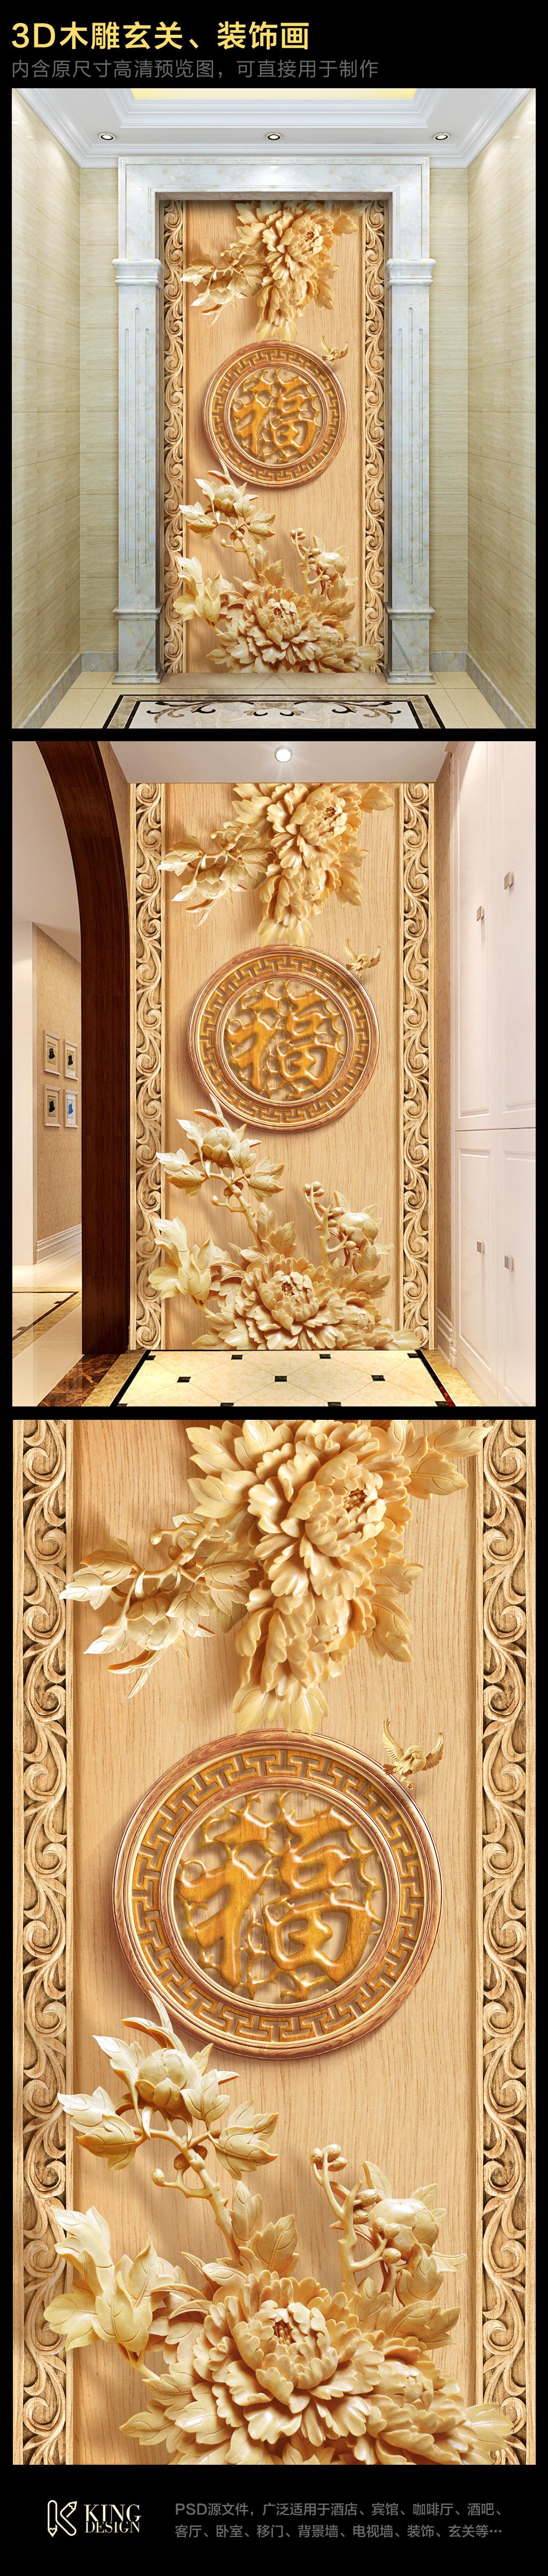 3d木雕牡丹福字玄关过道背景墙